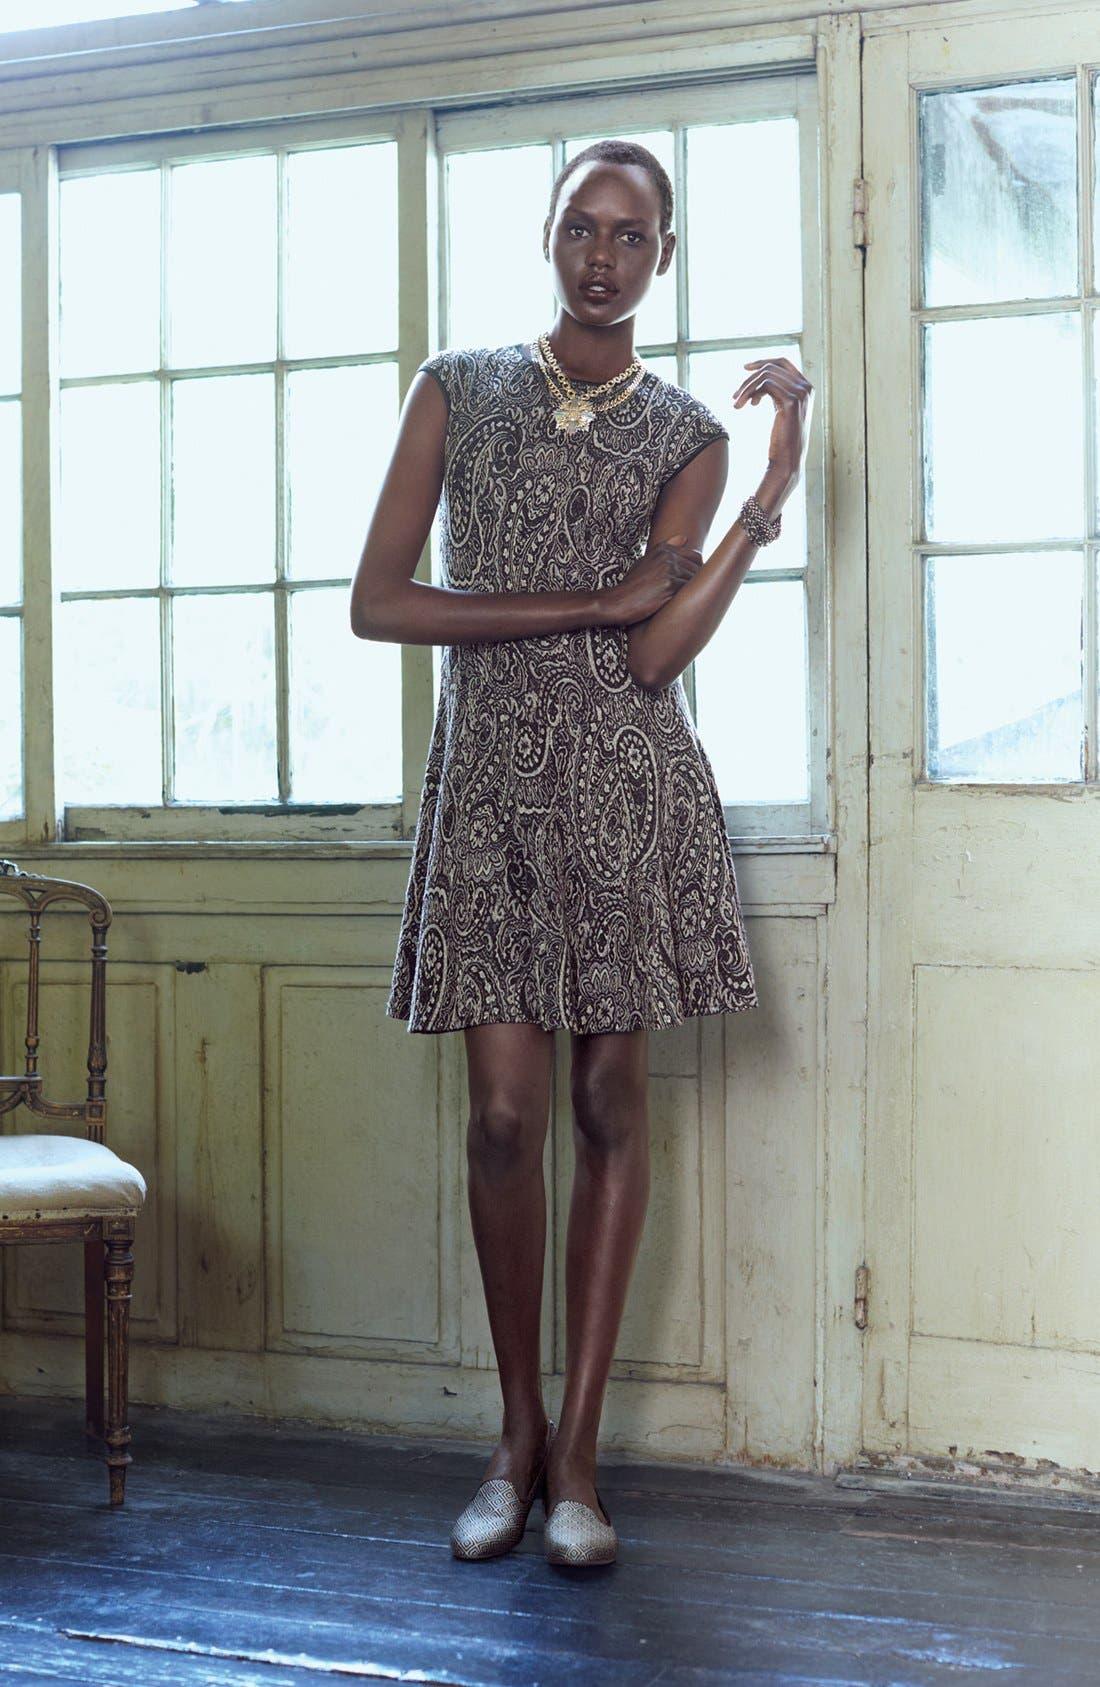 Alternate Image 1 Selected - Gabby Skye Sweater Dress & Accessories